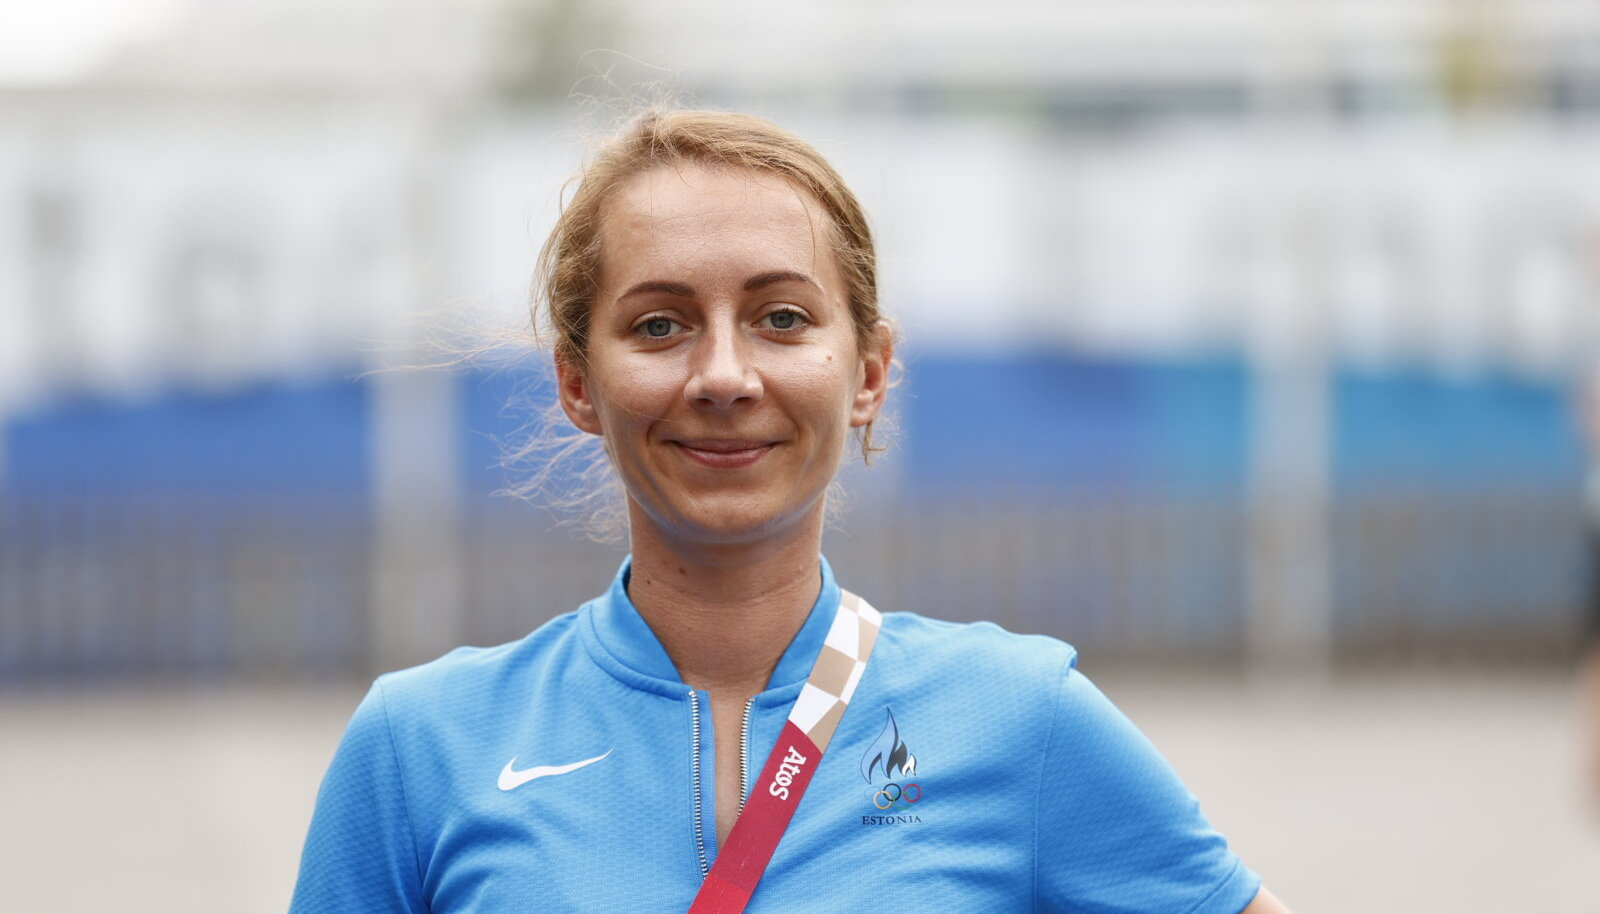 Snežana Stoljarova